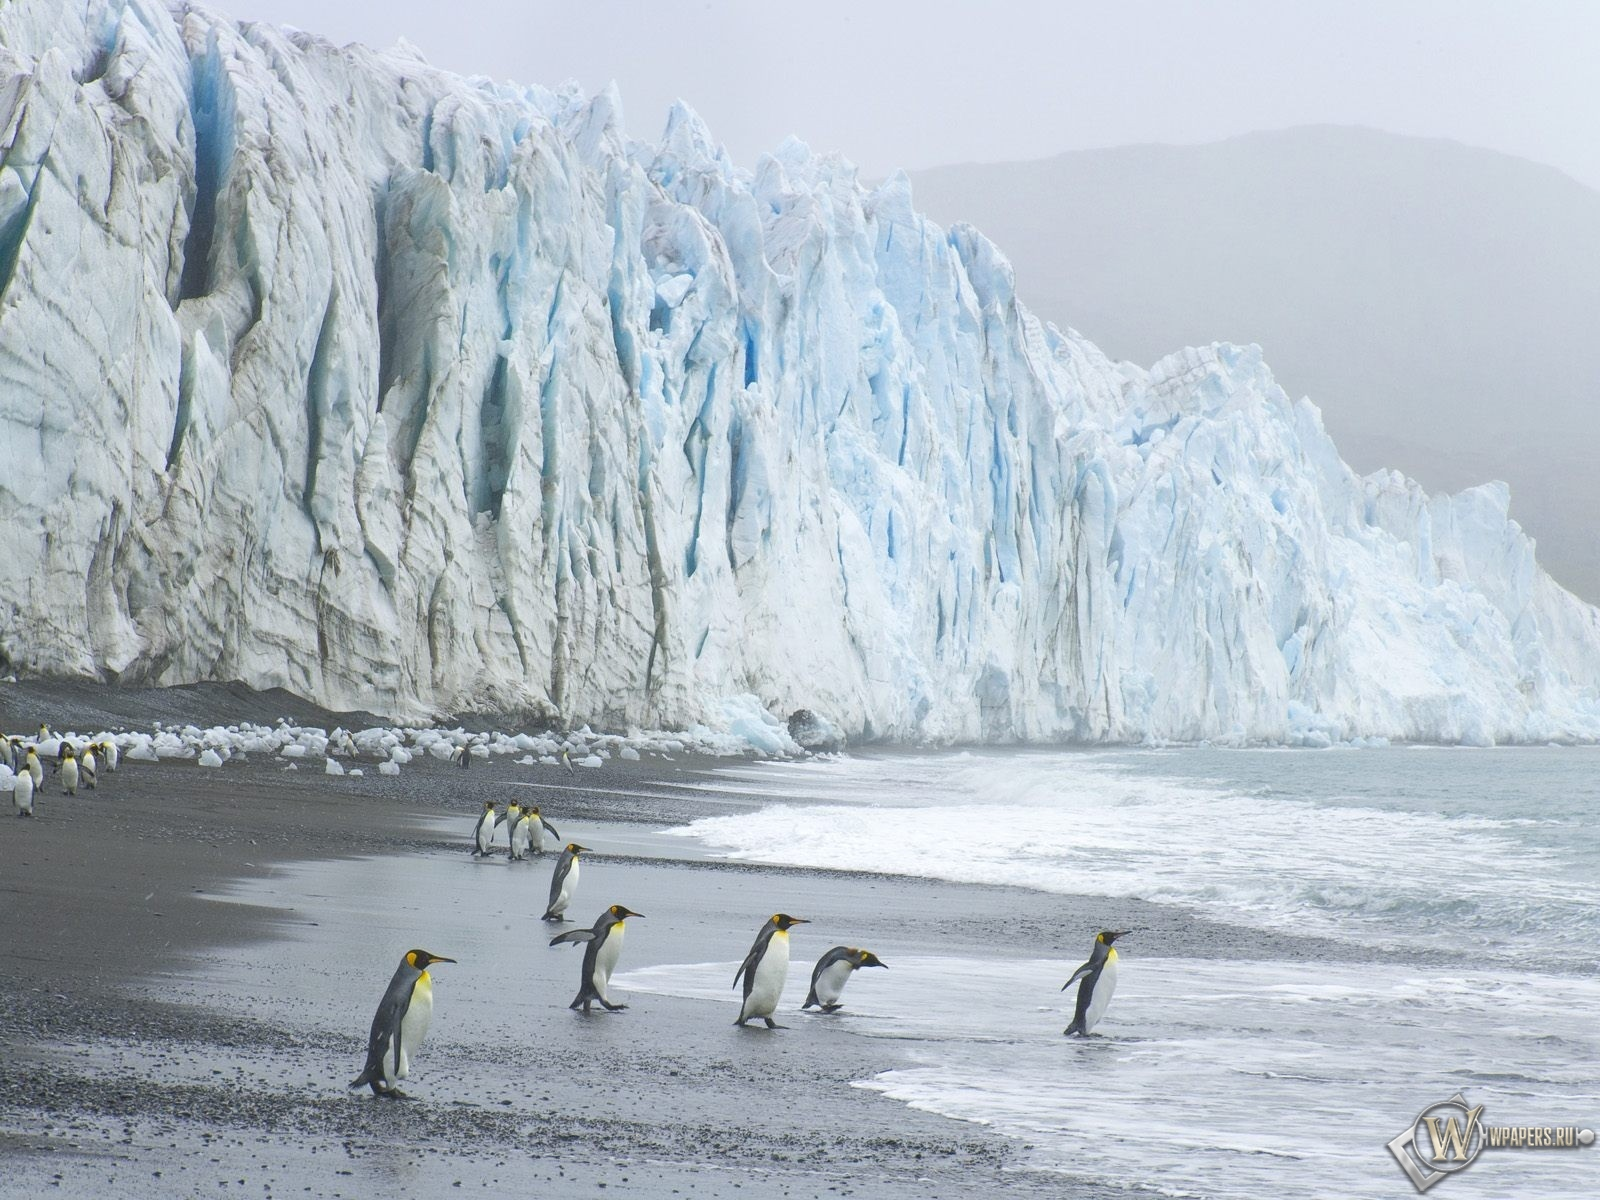 Пингвины на леднике 1600x1200